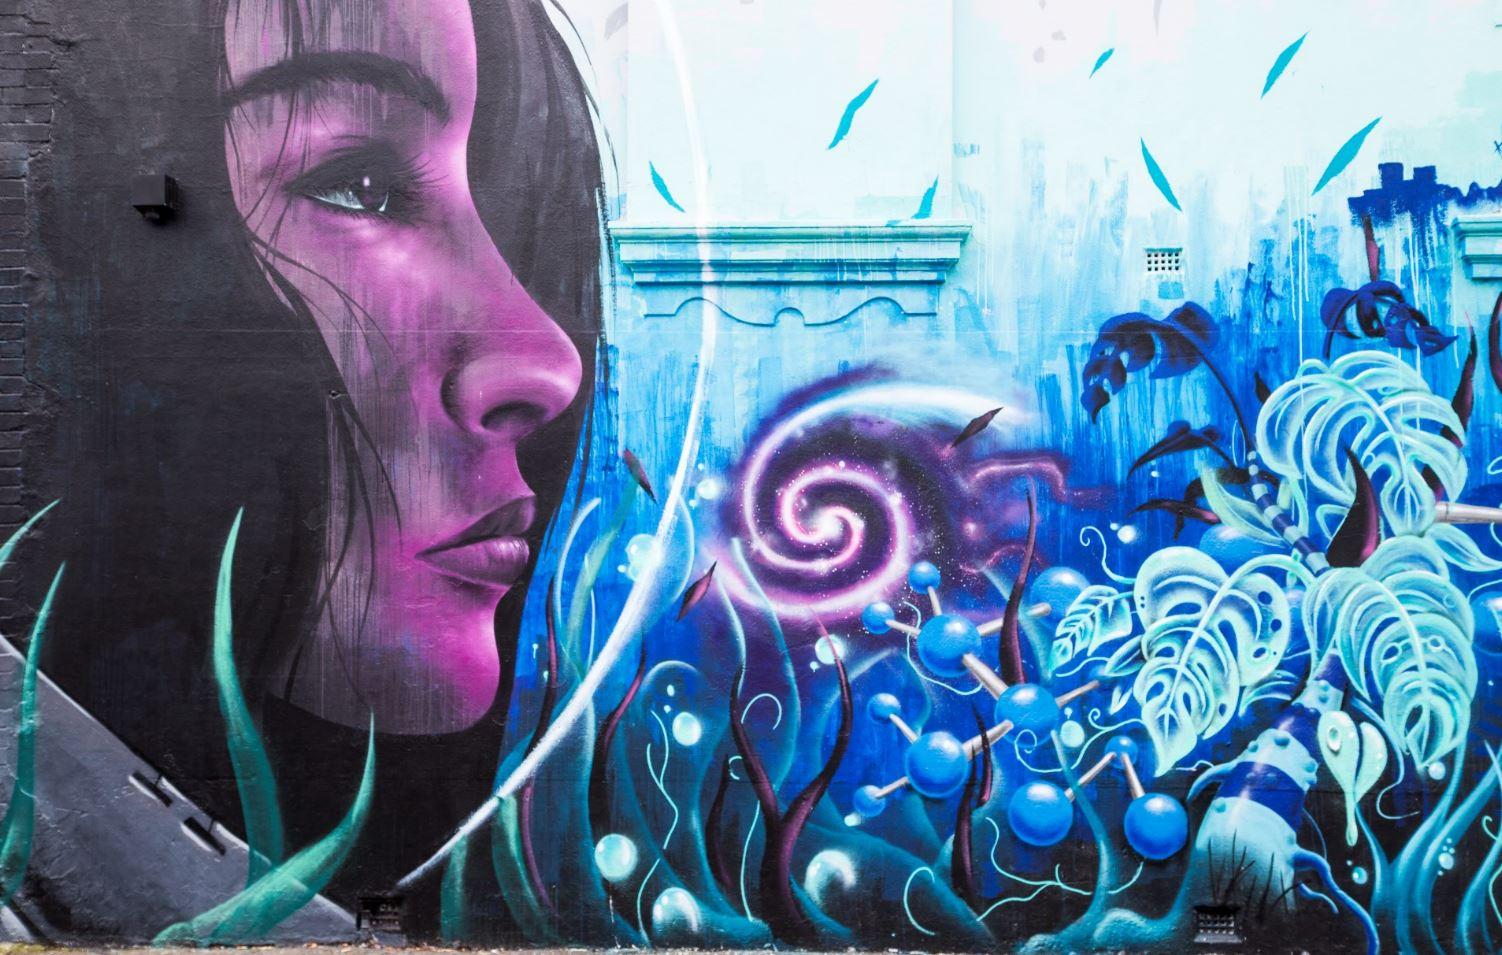 Barry St 1 Chapel Street Street Art